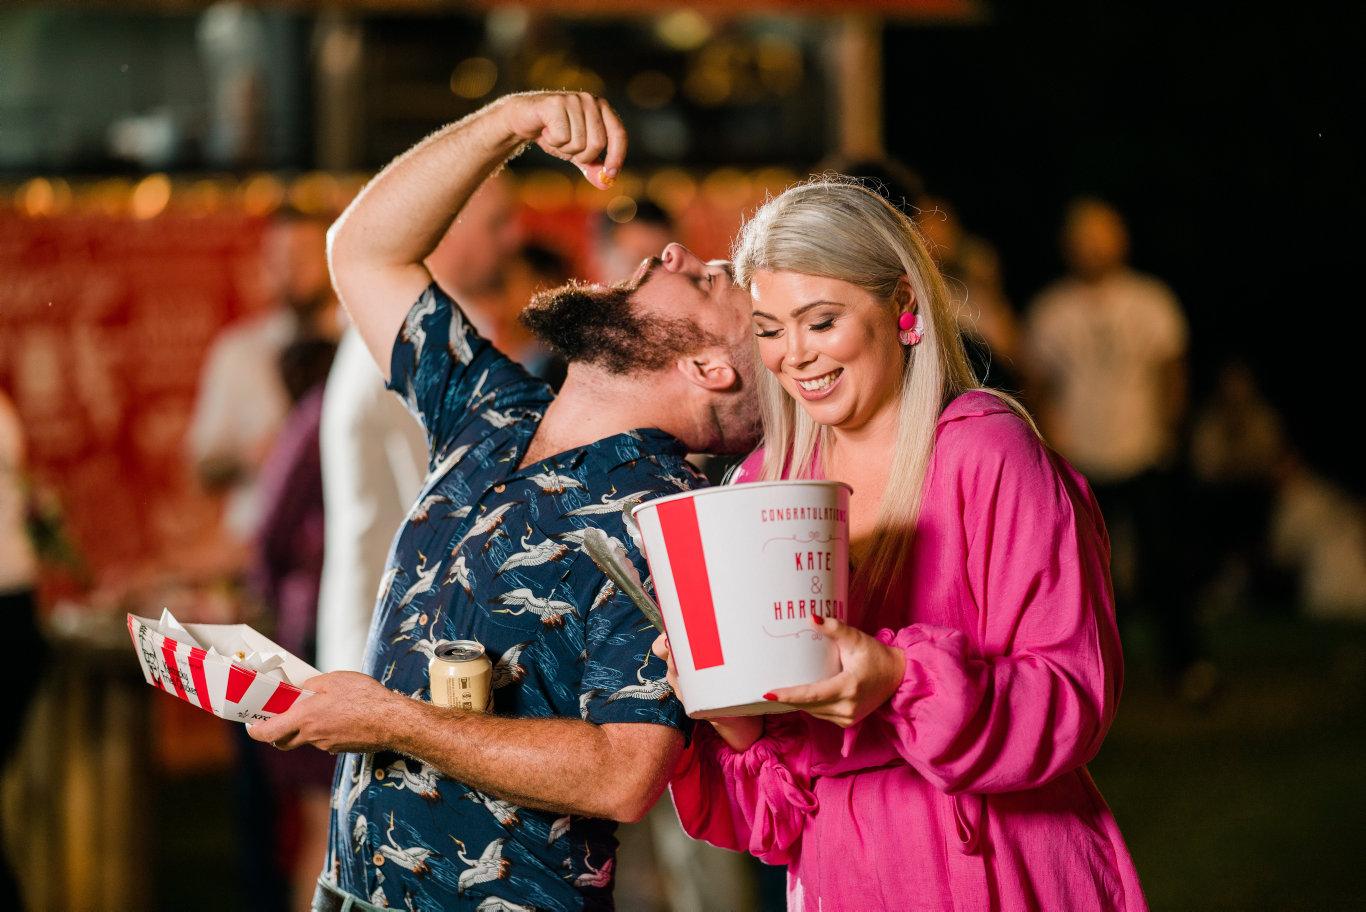 Photos from Toowoomba couple Kate and Harrison Cann's KFC wedding.